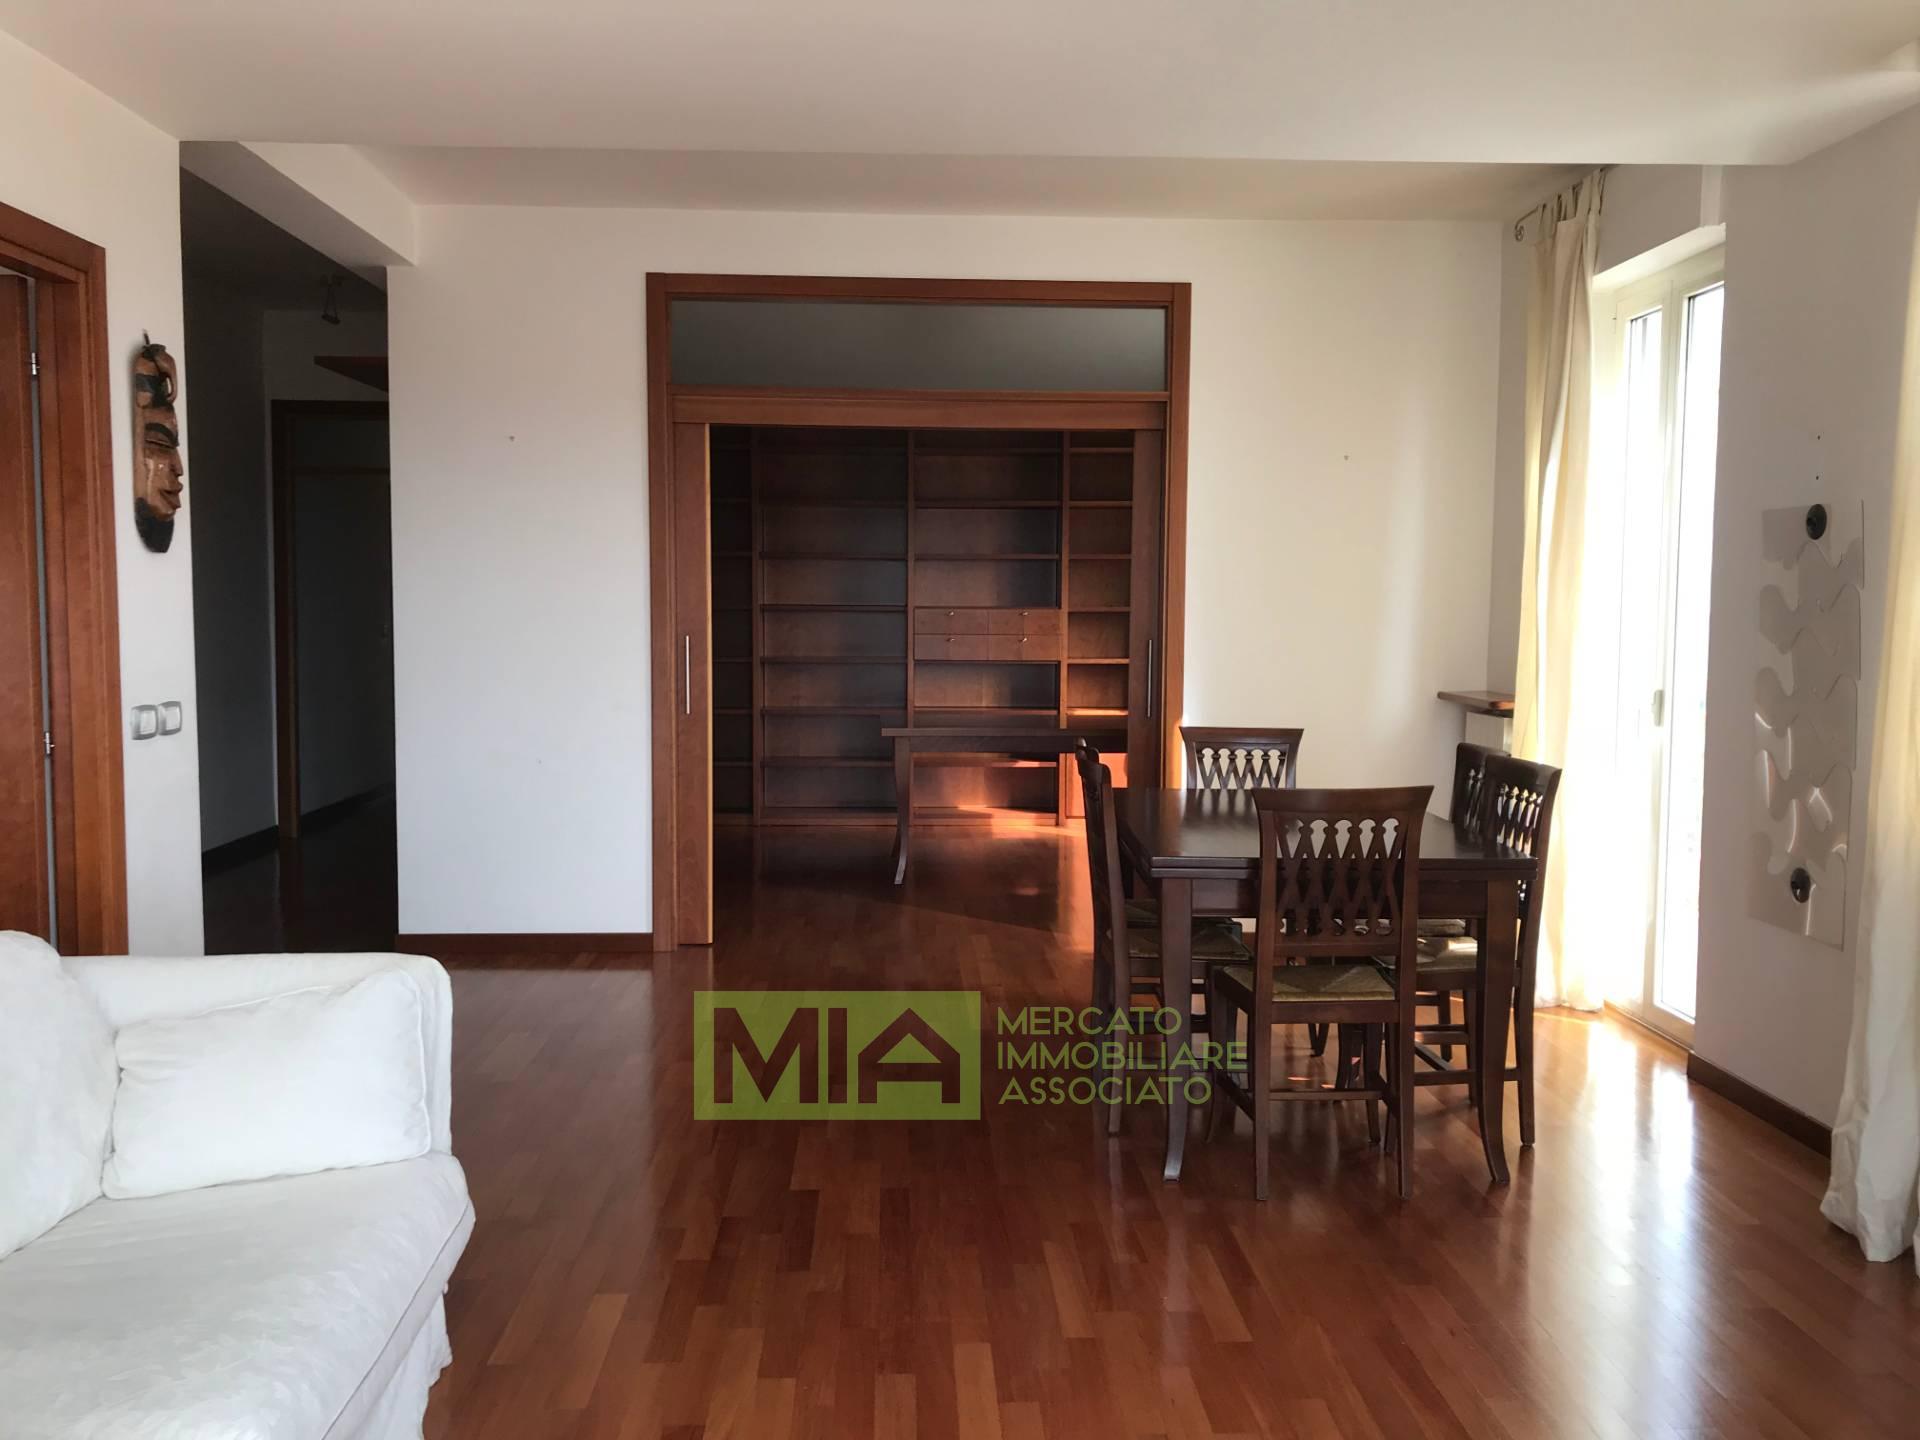 Appartamento MACERATA vendita  C.SO CAIROLI  Casatasso S.r.l.